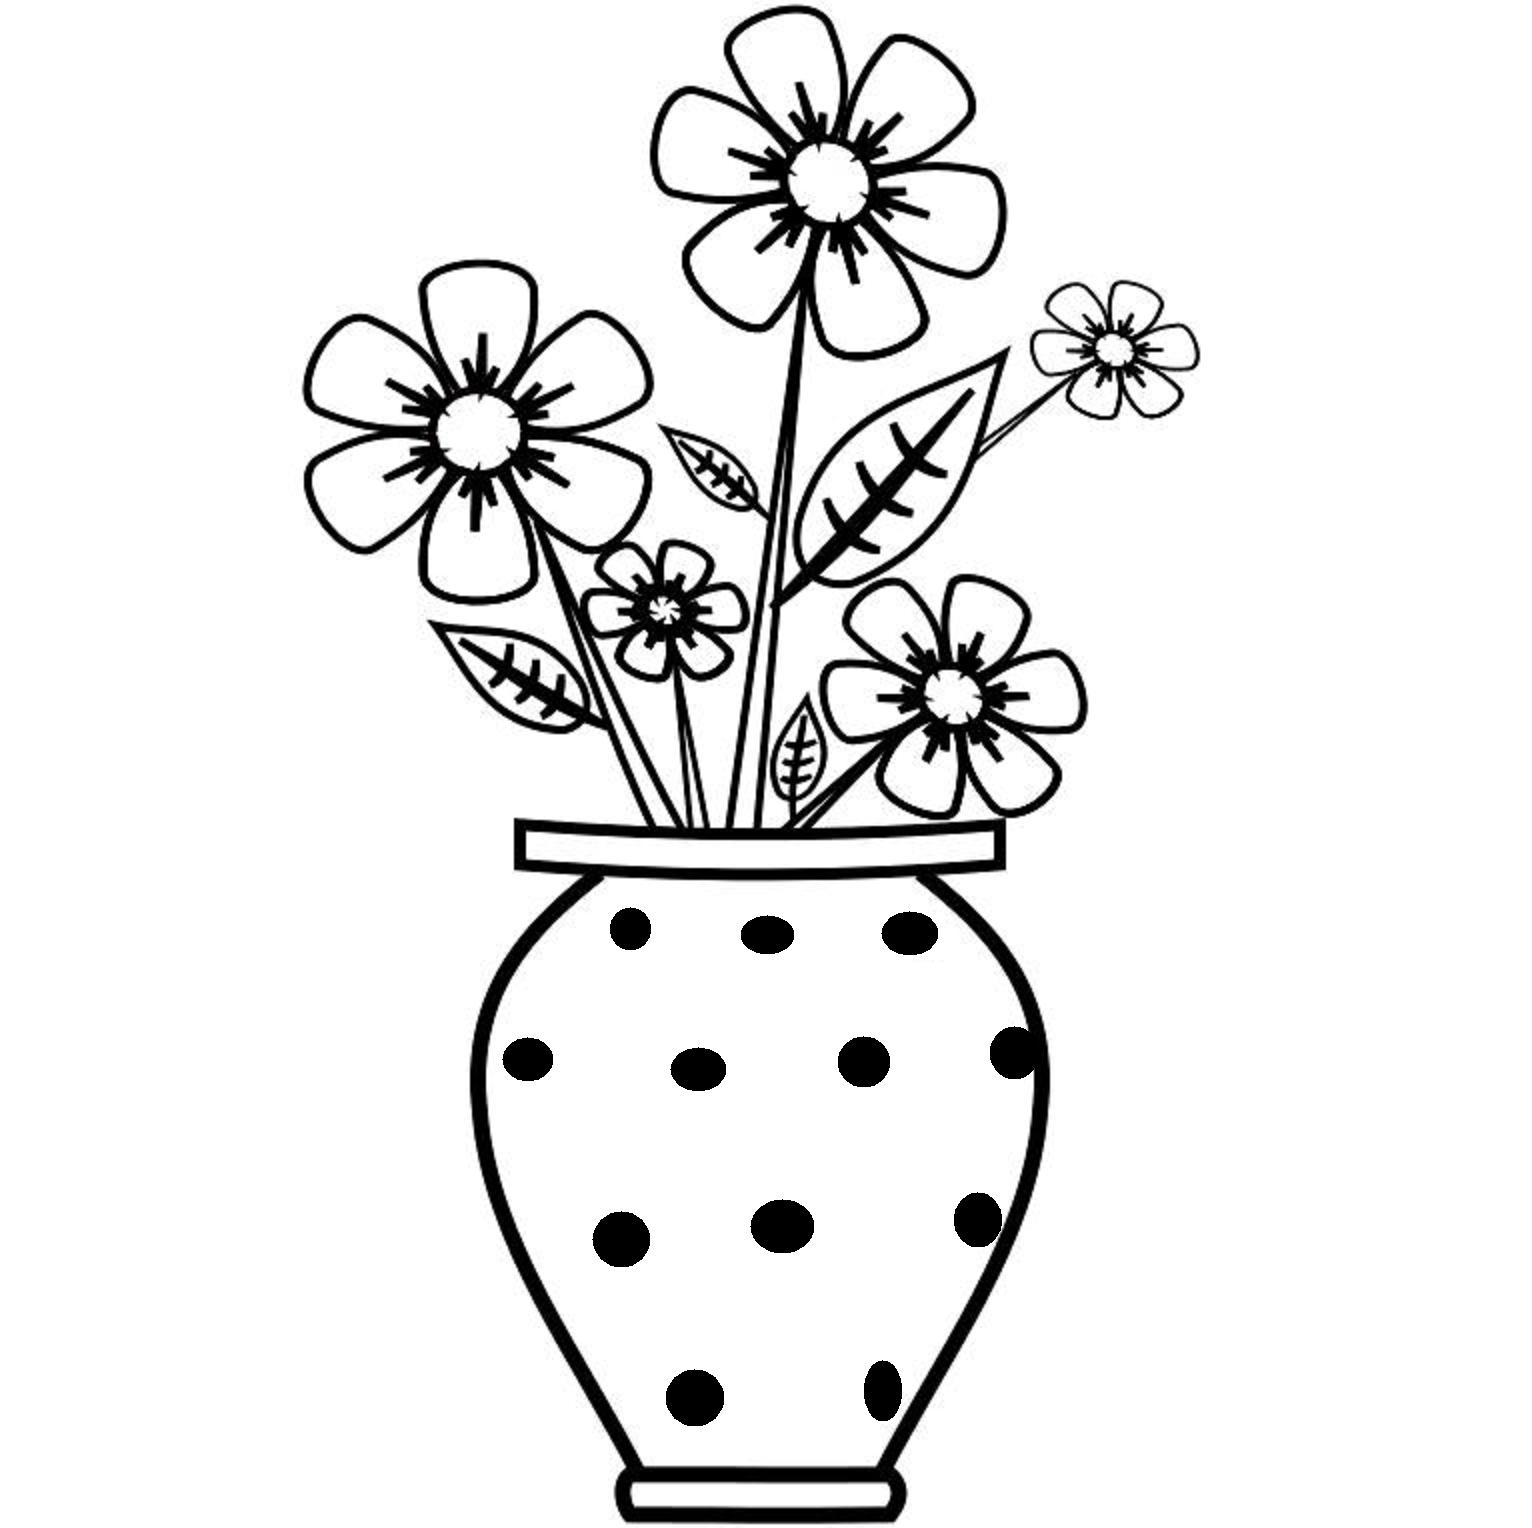 1532x1528 Easy Drawing Of Flower Vase